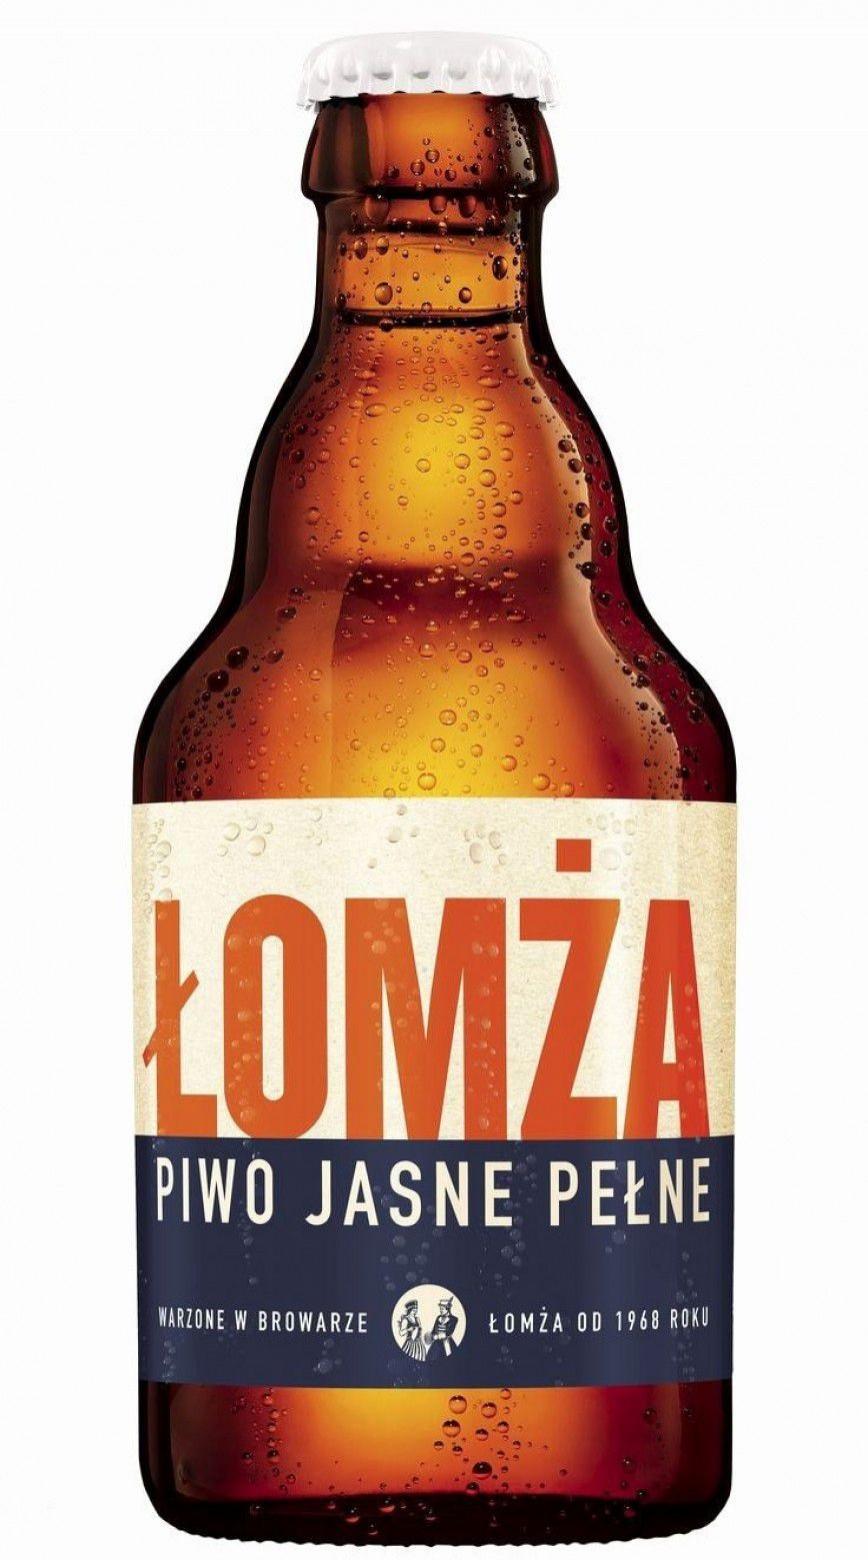 000 Unusual Microsoft Word Beer Label Template Inspiration  Bottle868